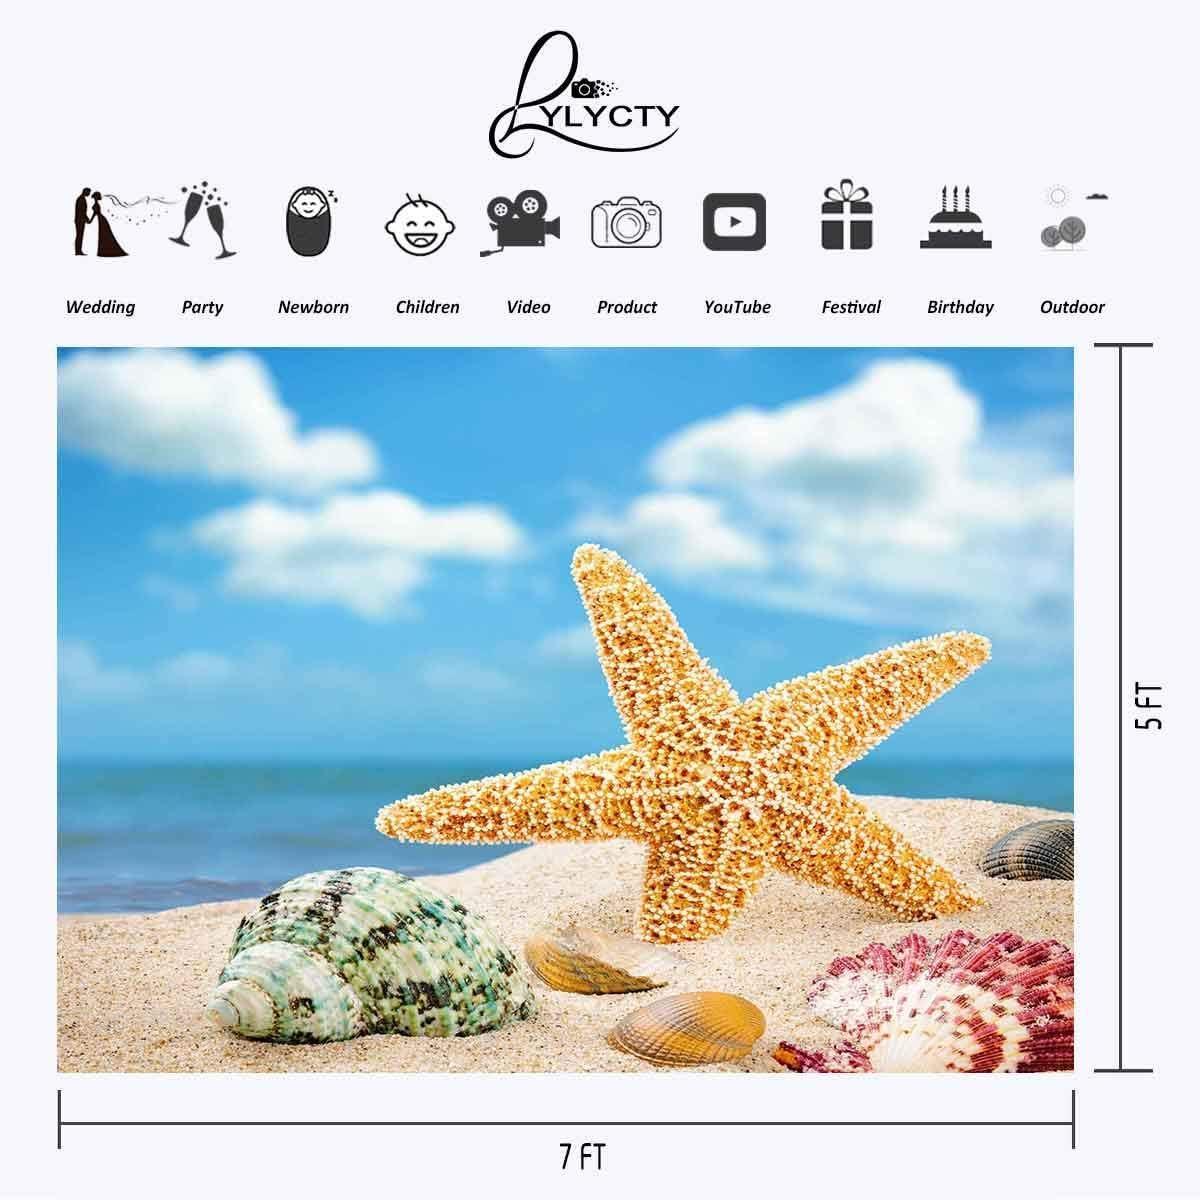 SZZWY 7x5ft Backdrop Beach Conch Starfish Ocean Series Photography Backdrop Photo Photography Background Props Studio Indoor Decorations LYLX557